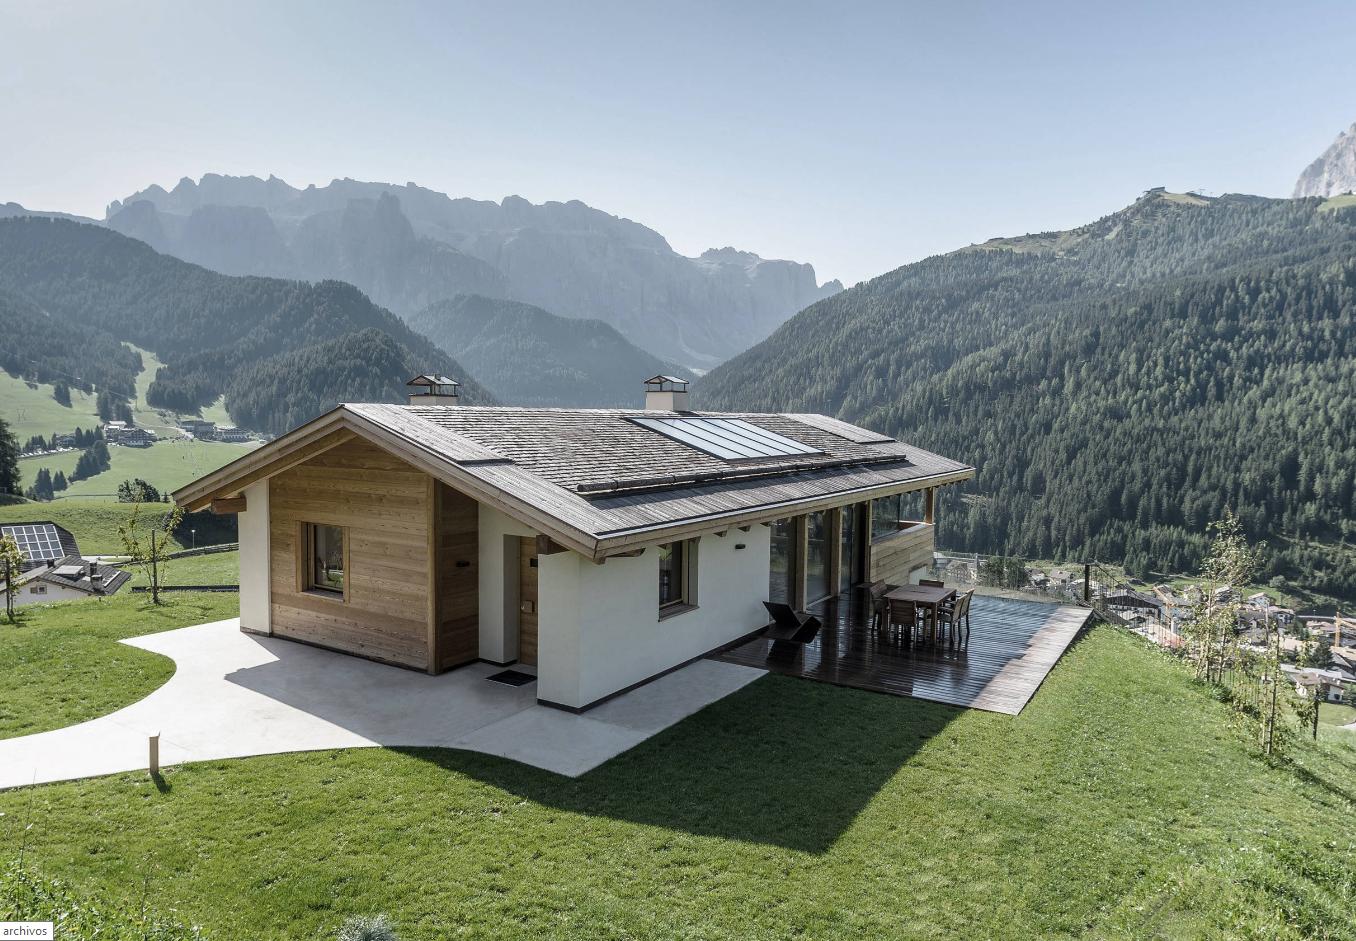 Come costruire una casa a risparmio energetico idealista news - Come costruire una casa in miniatura ...